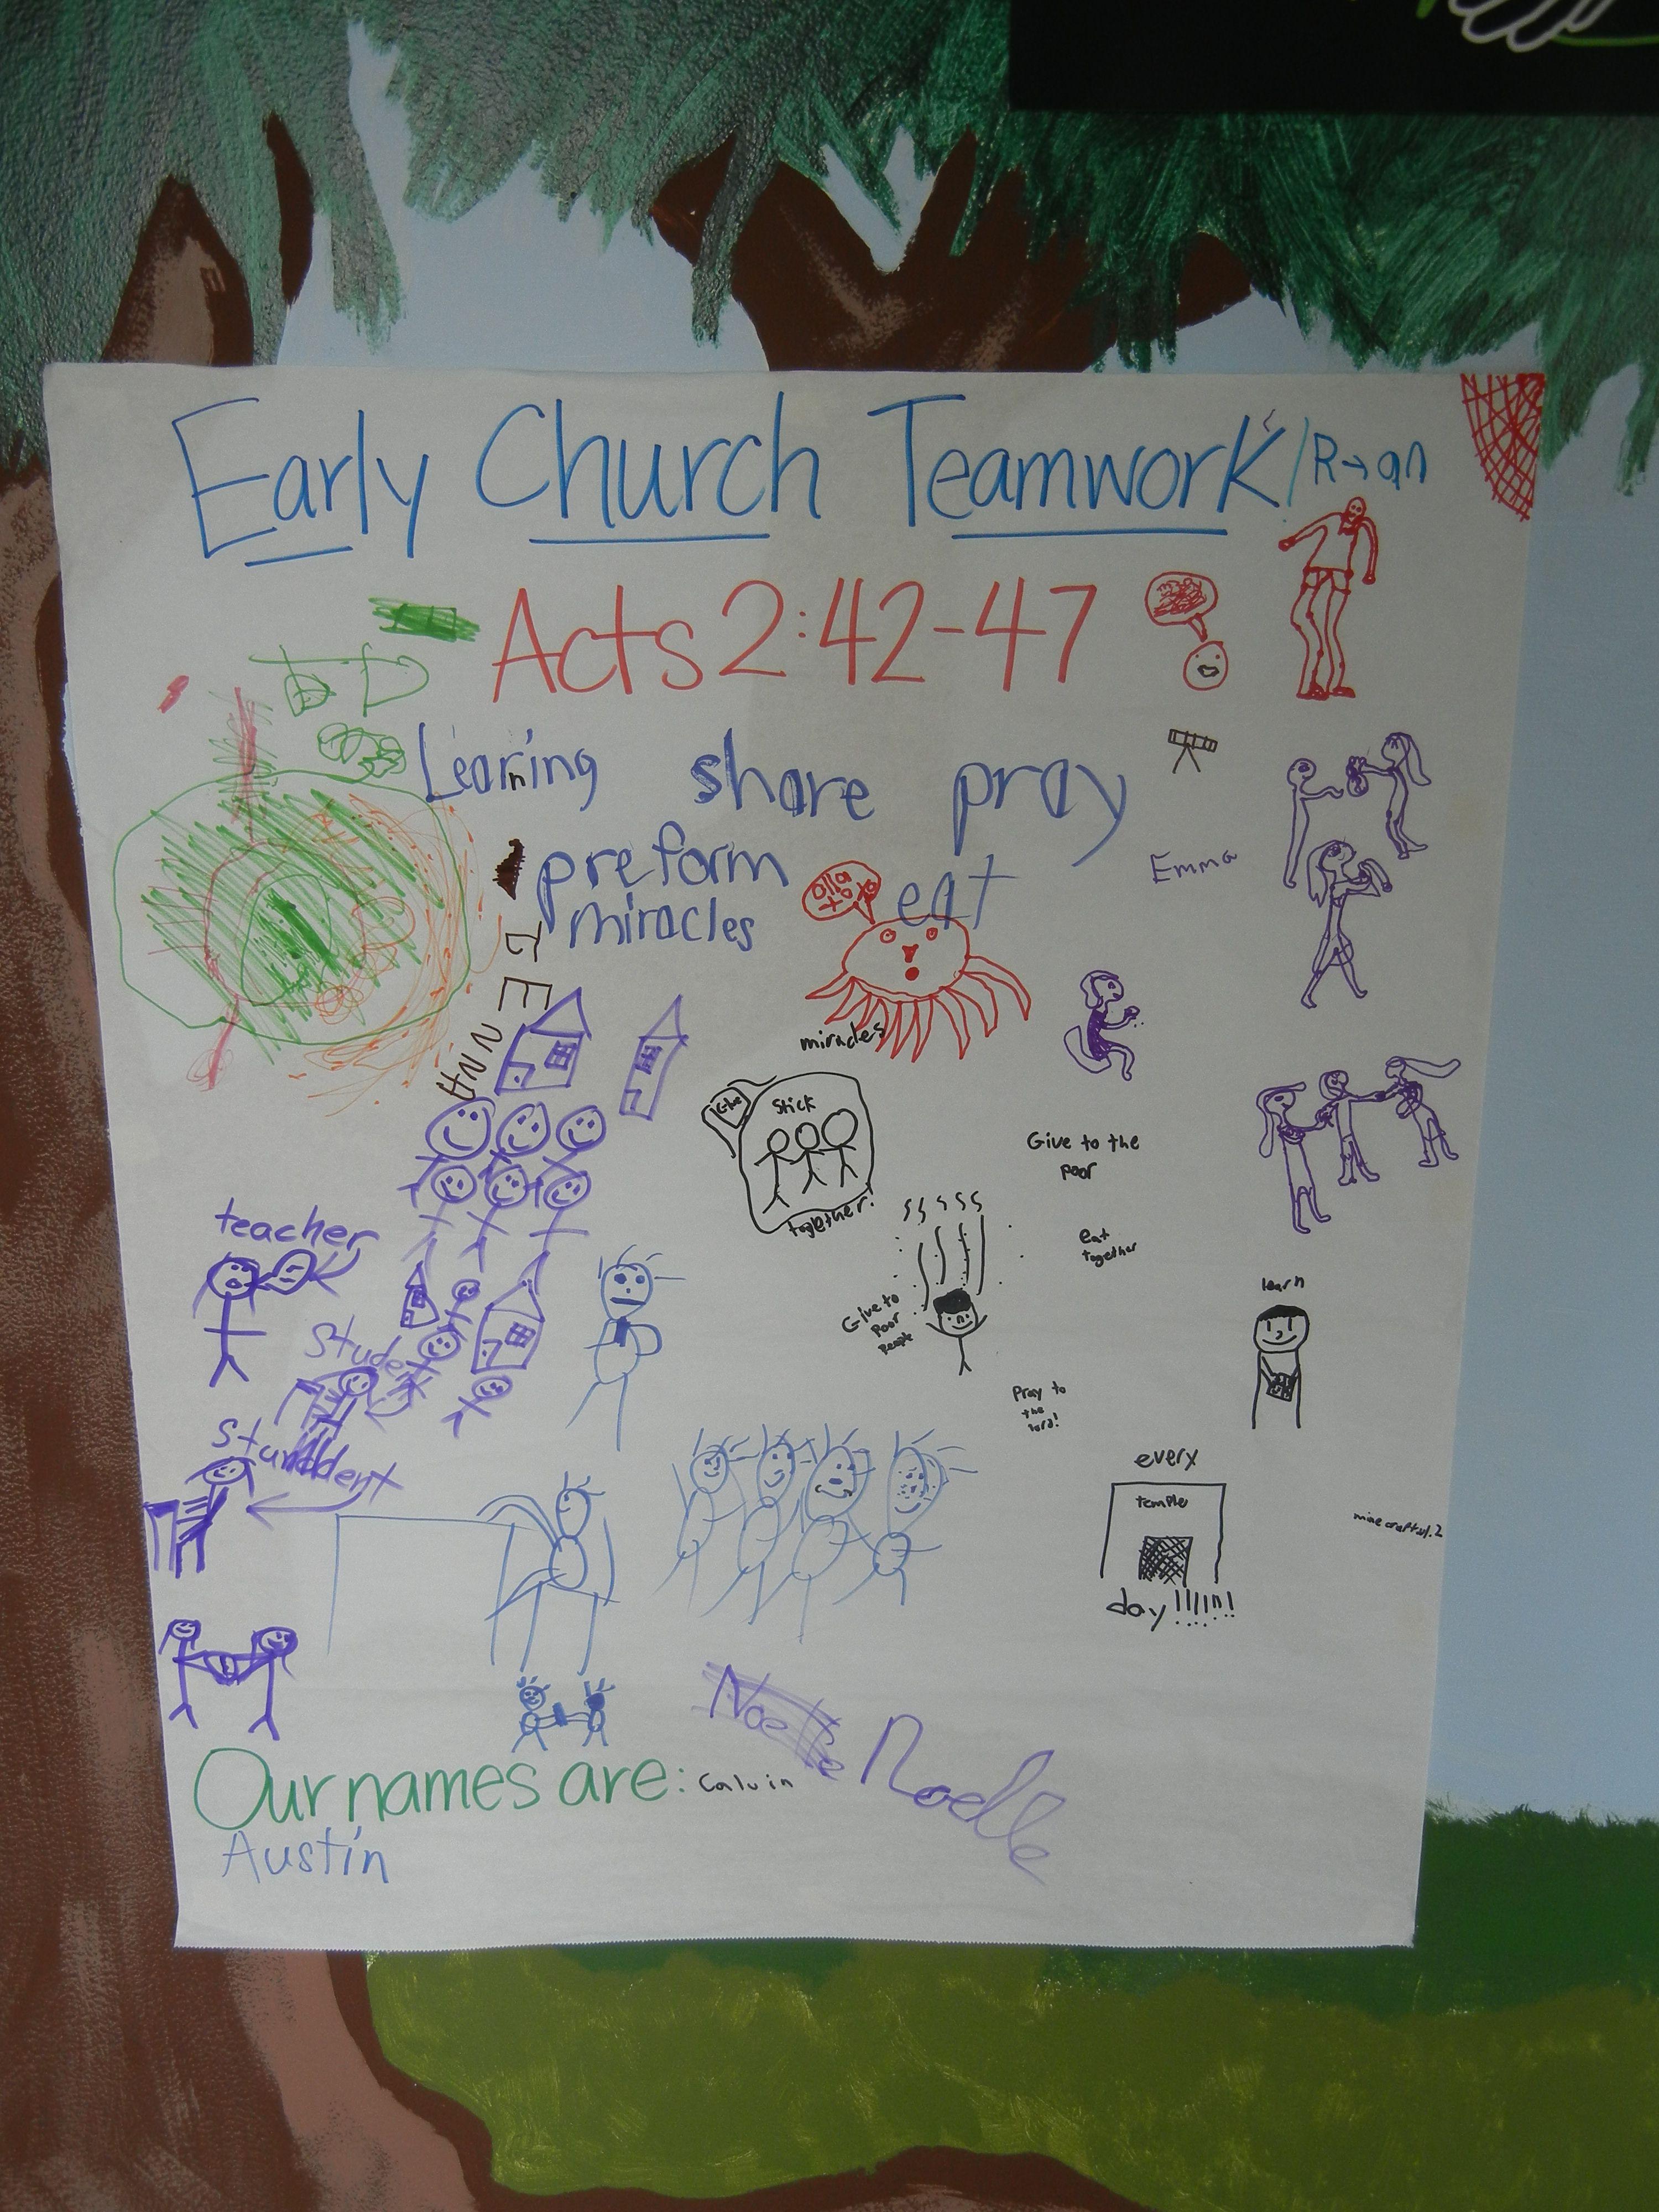 Early Church Teamwork Poster 2